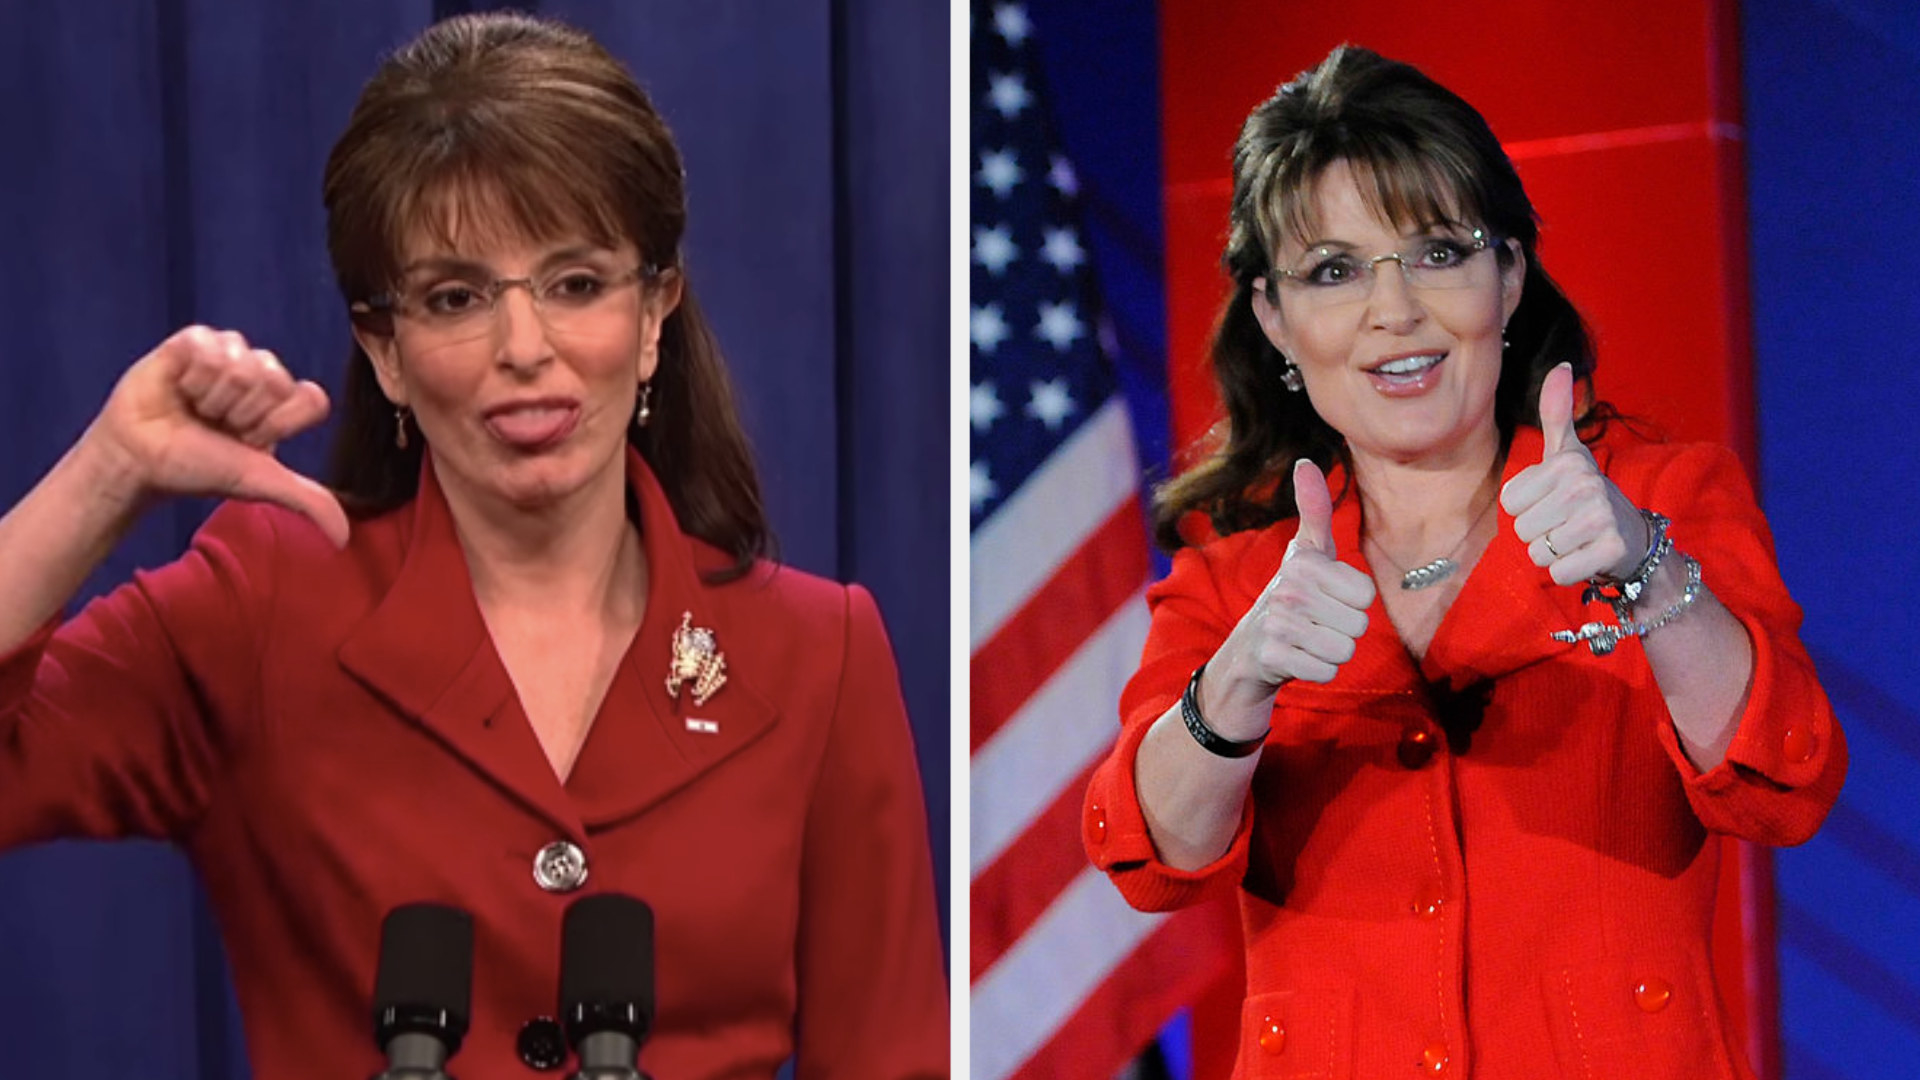 Tina Fey as Sarah Palin giving a thumbs down side by side to Sarah Palin giving two thumbs up